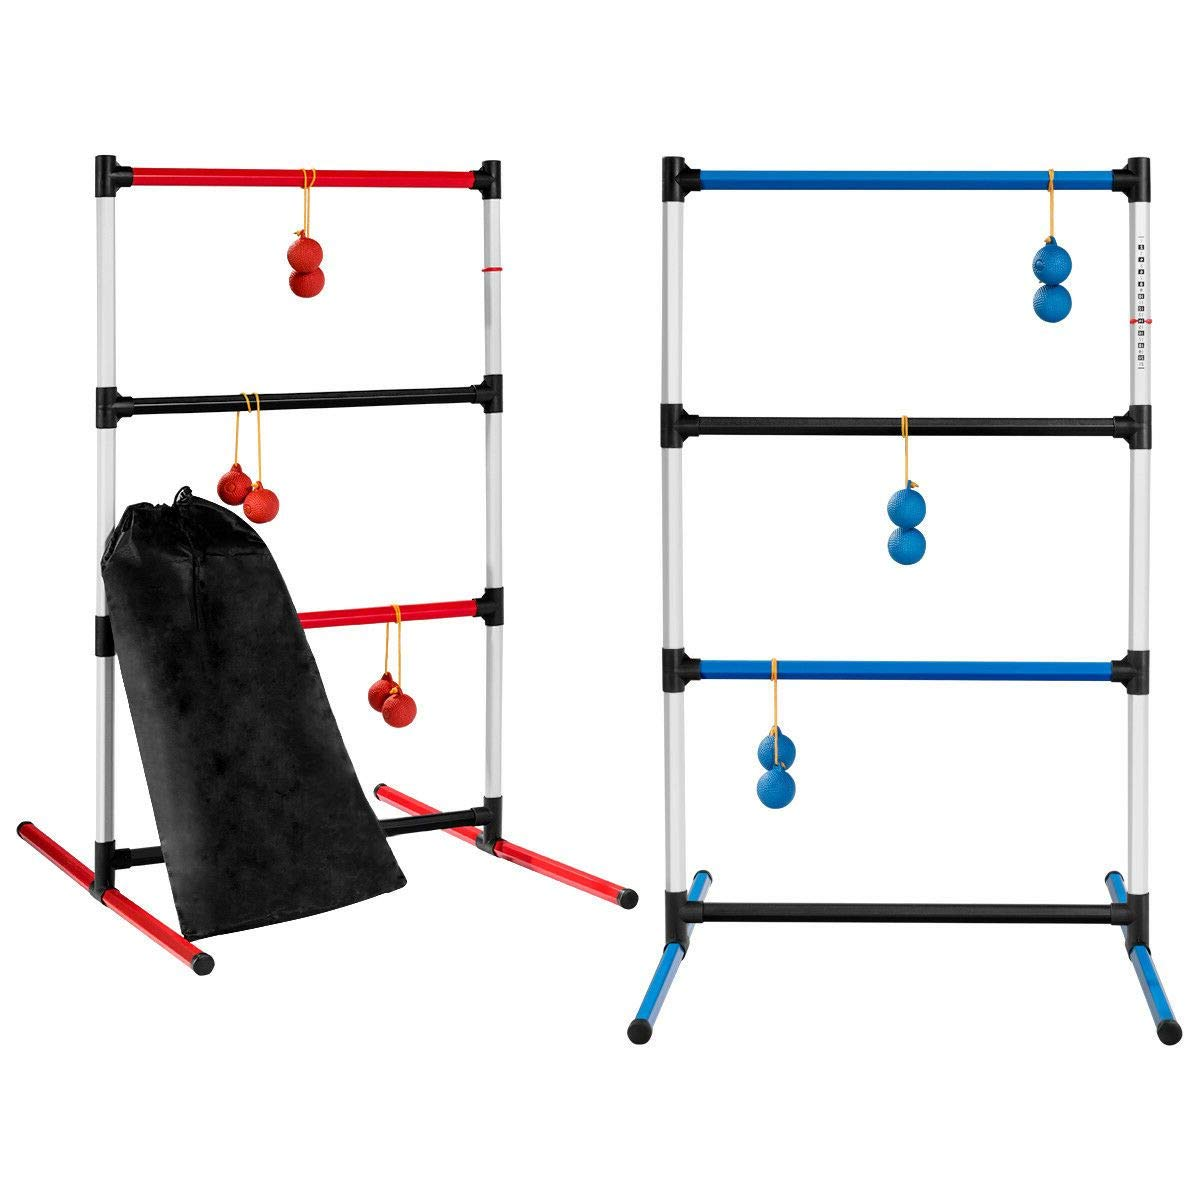 Aromzen Portable Ladder Ball Family Indoor Outdoor Game Sport 12 Balls W/Bag